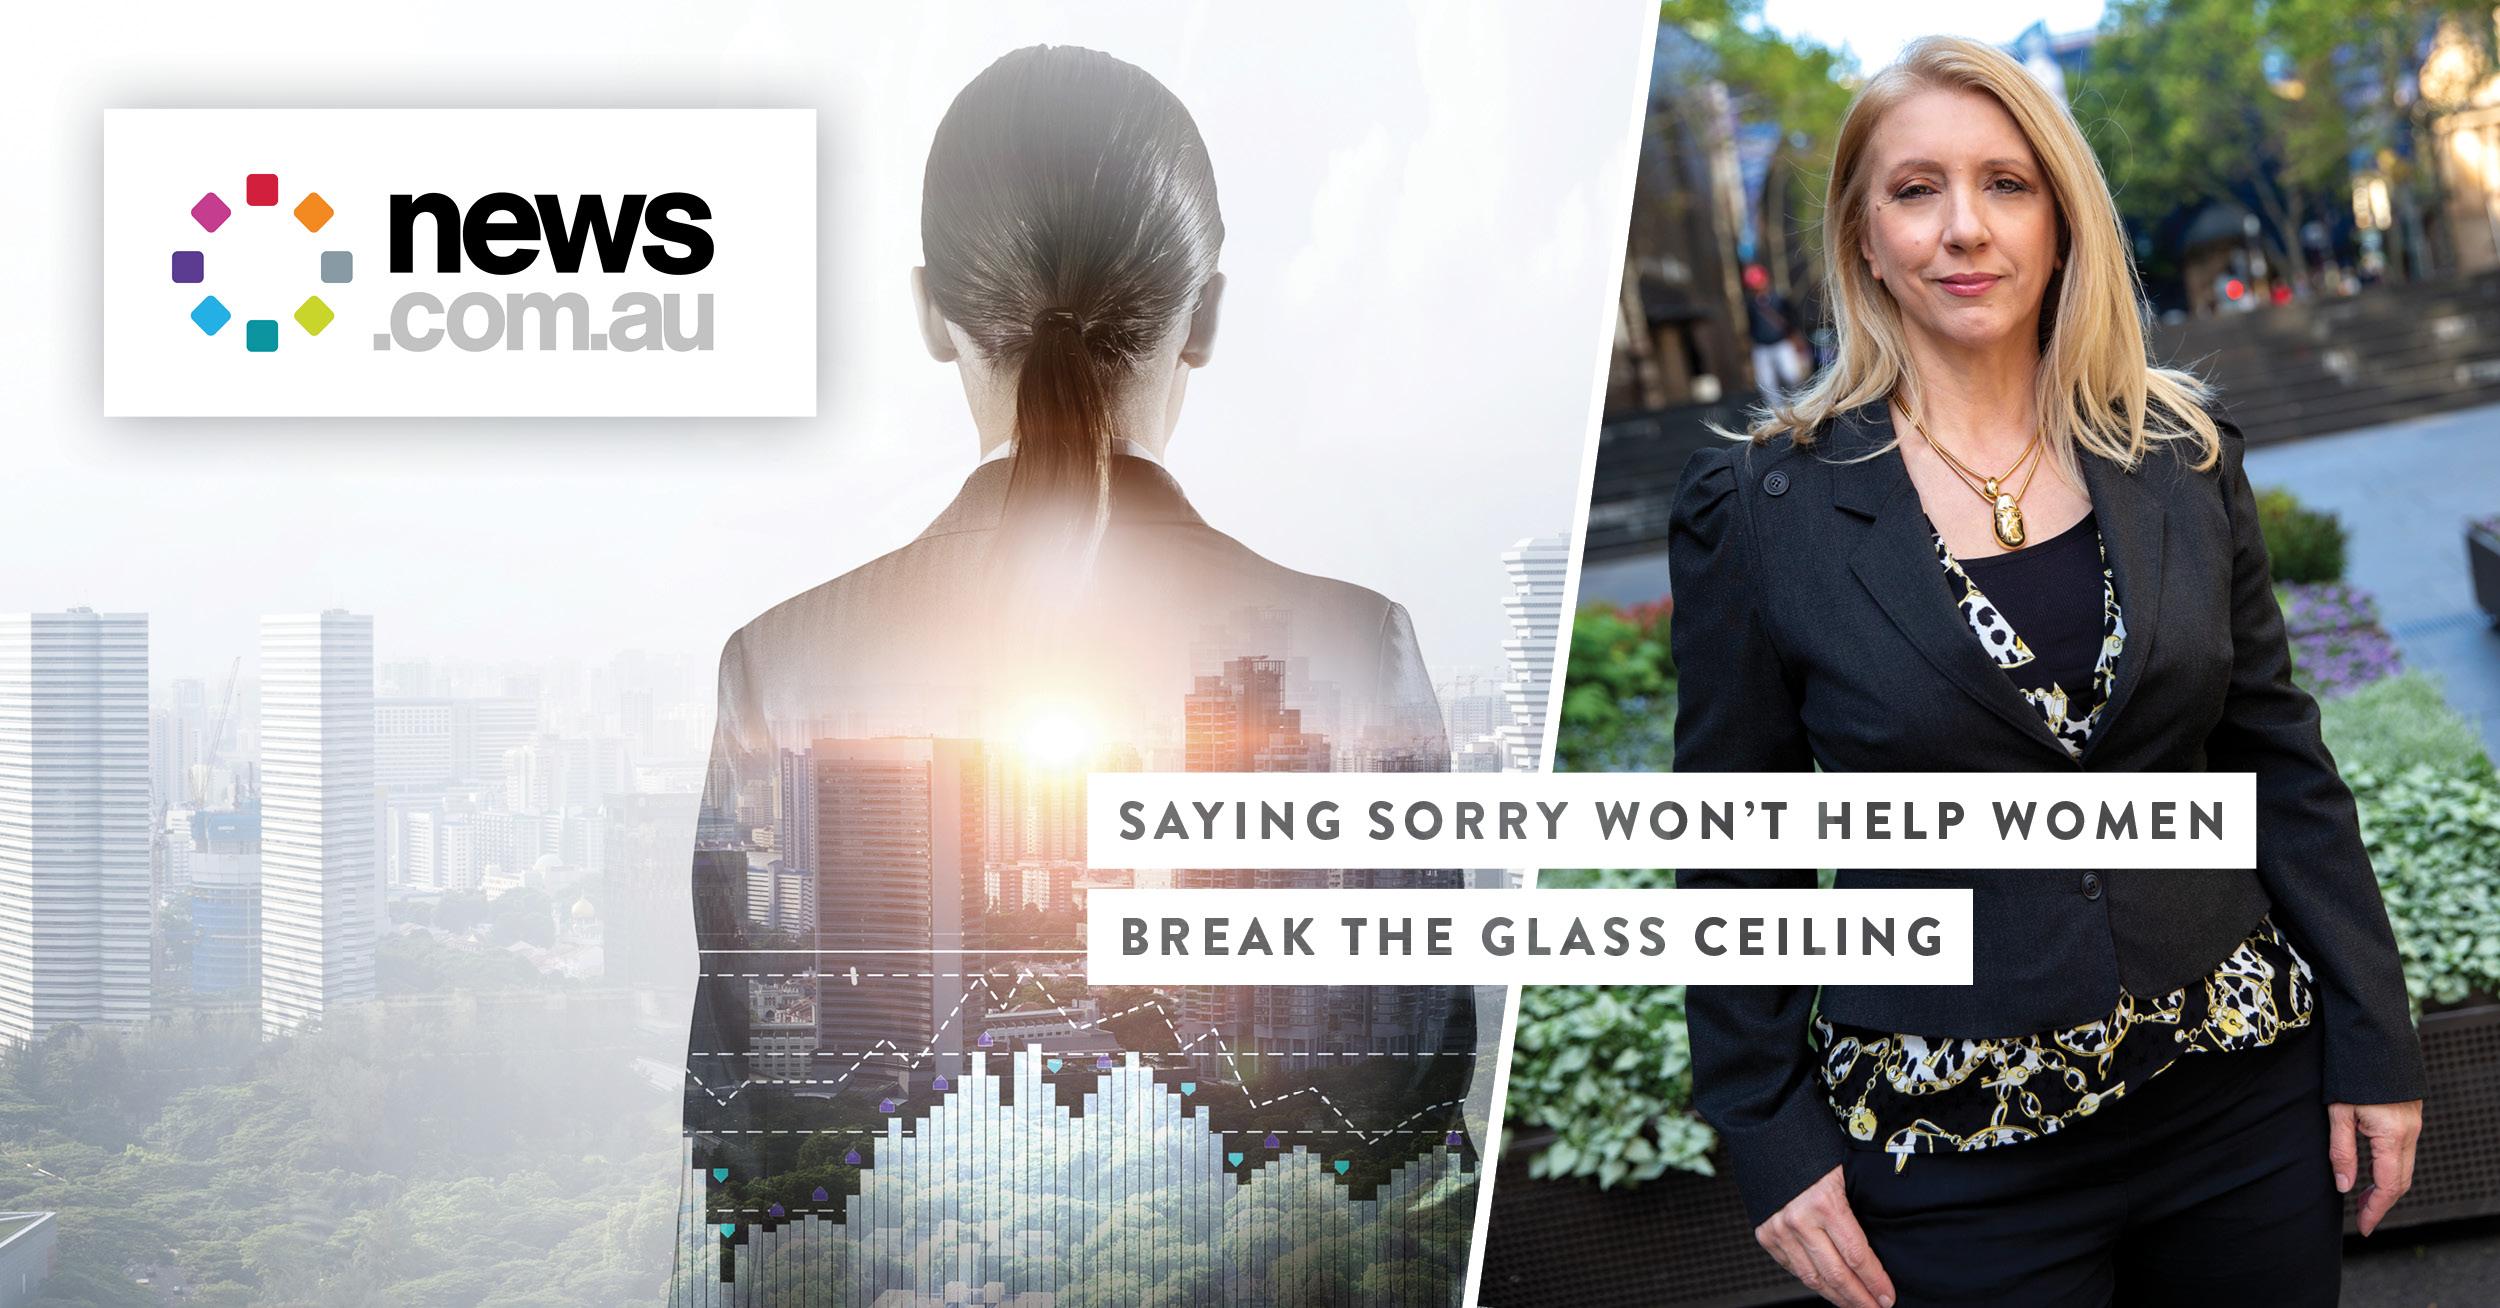 News.com.au: Saying Sorry Won't Help Women Break The Glass Ceiling